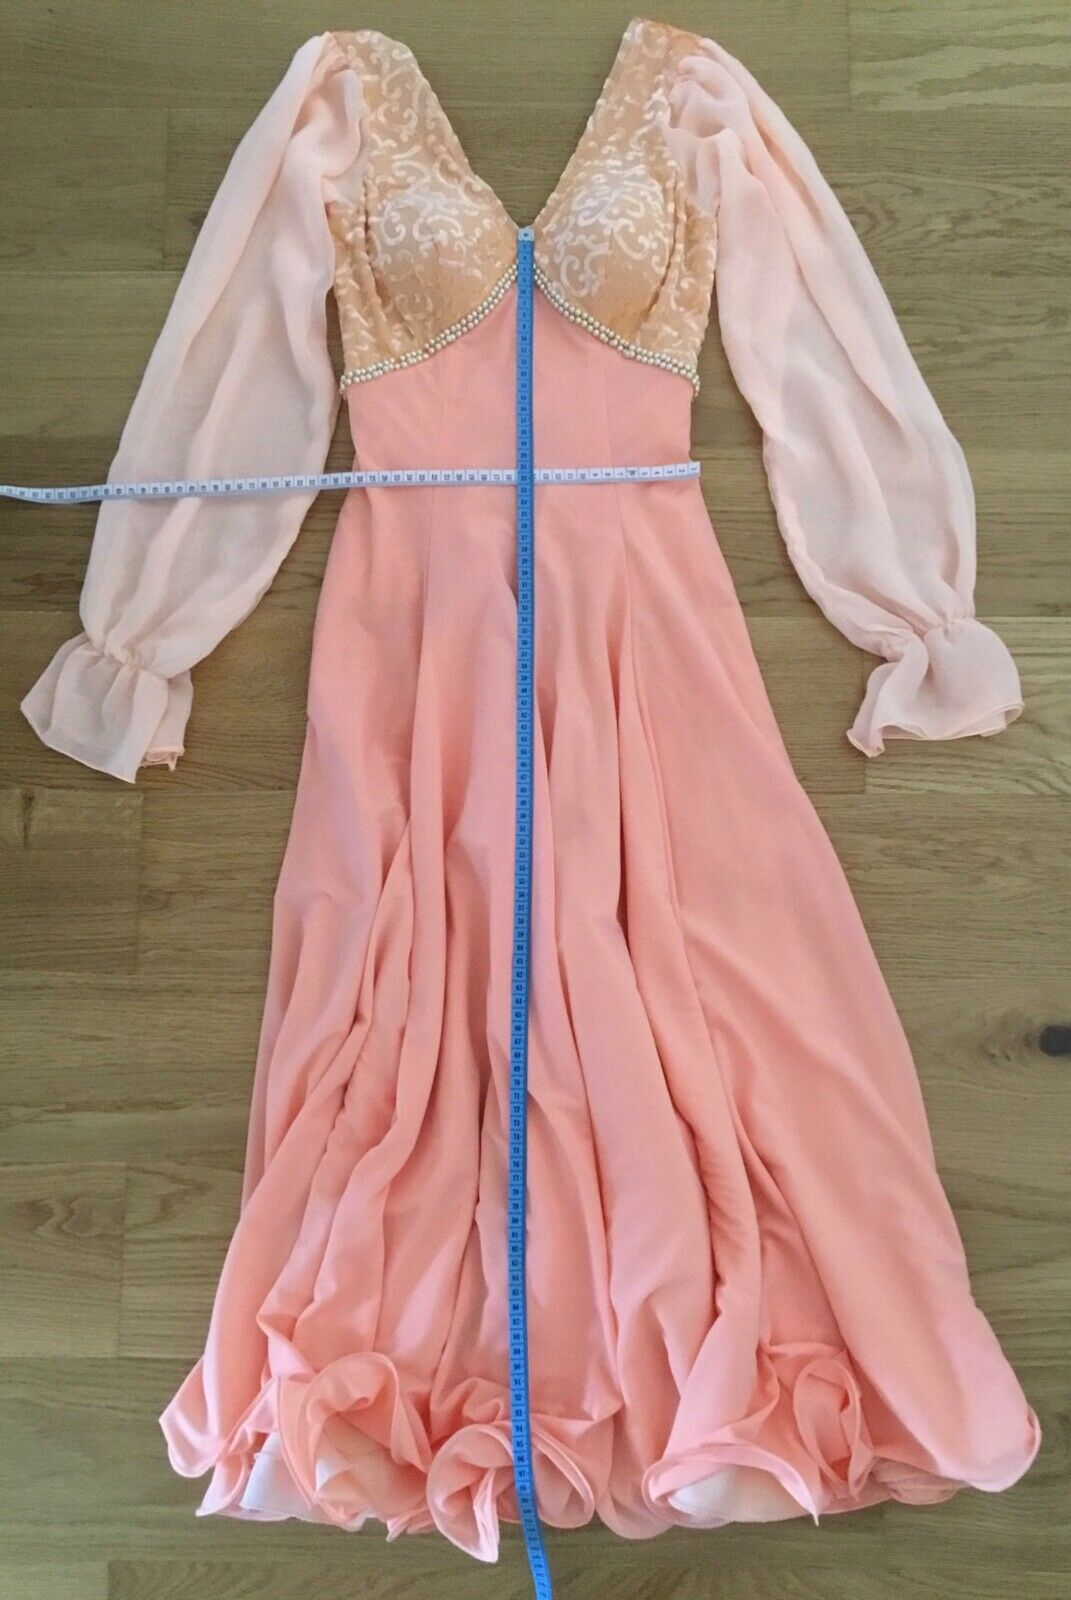 Adult Ballroom Dance Dress Ladies Dancewear Costumes